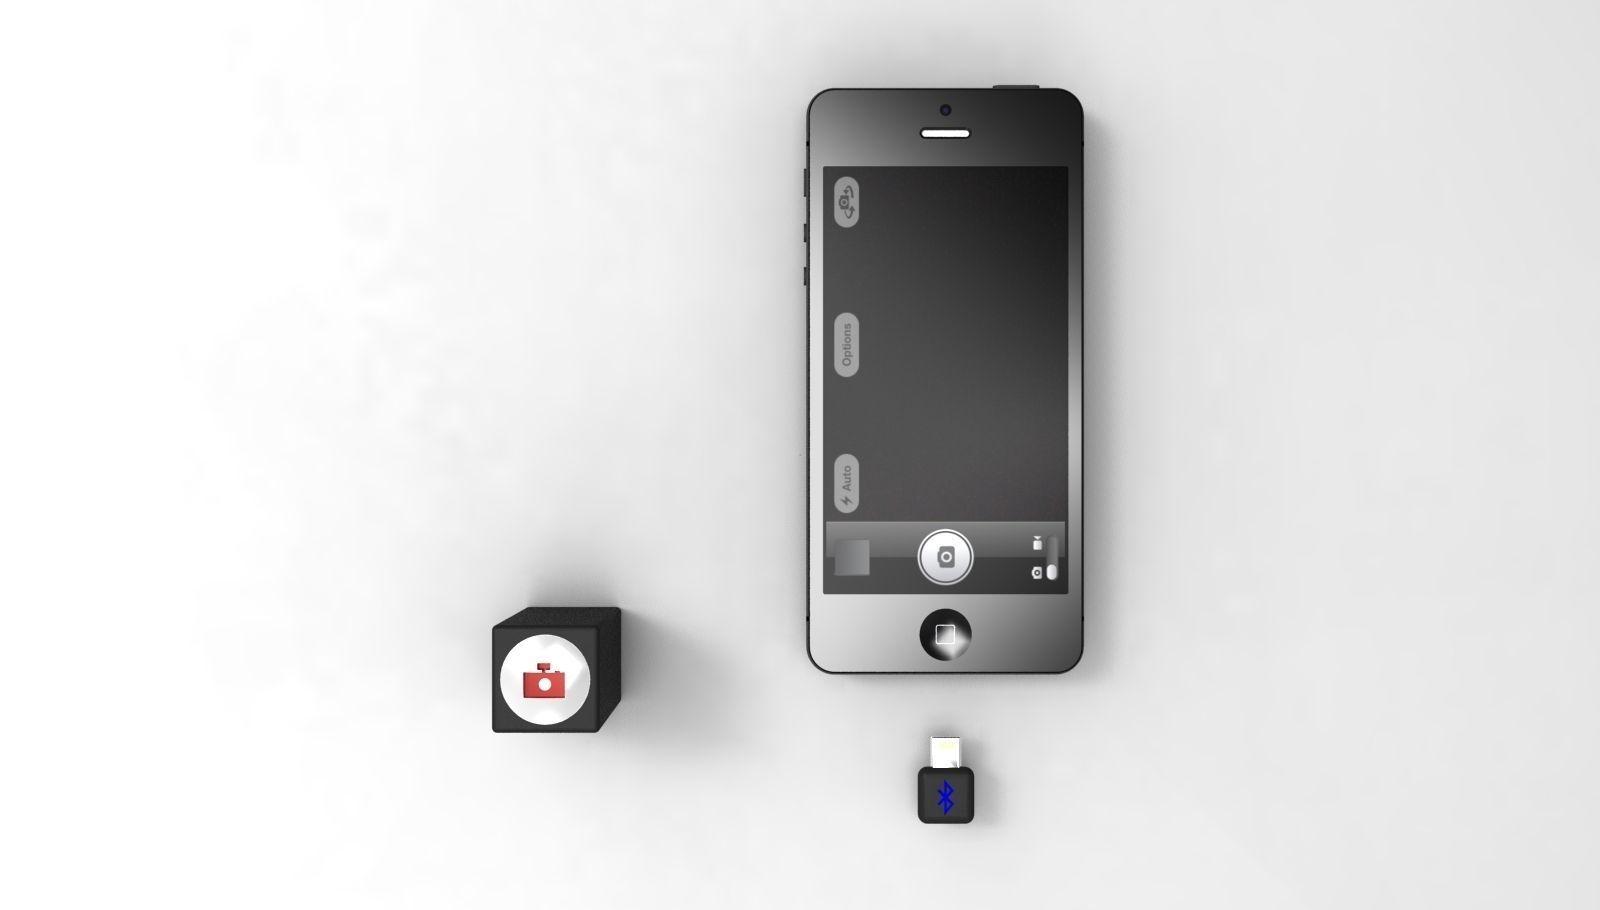 iPhone 5 Bluetooth Remote Camera Control 3D model DAE SKP